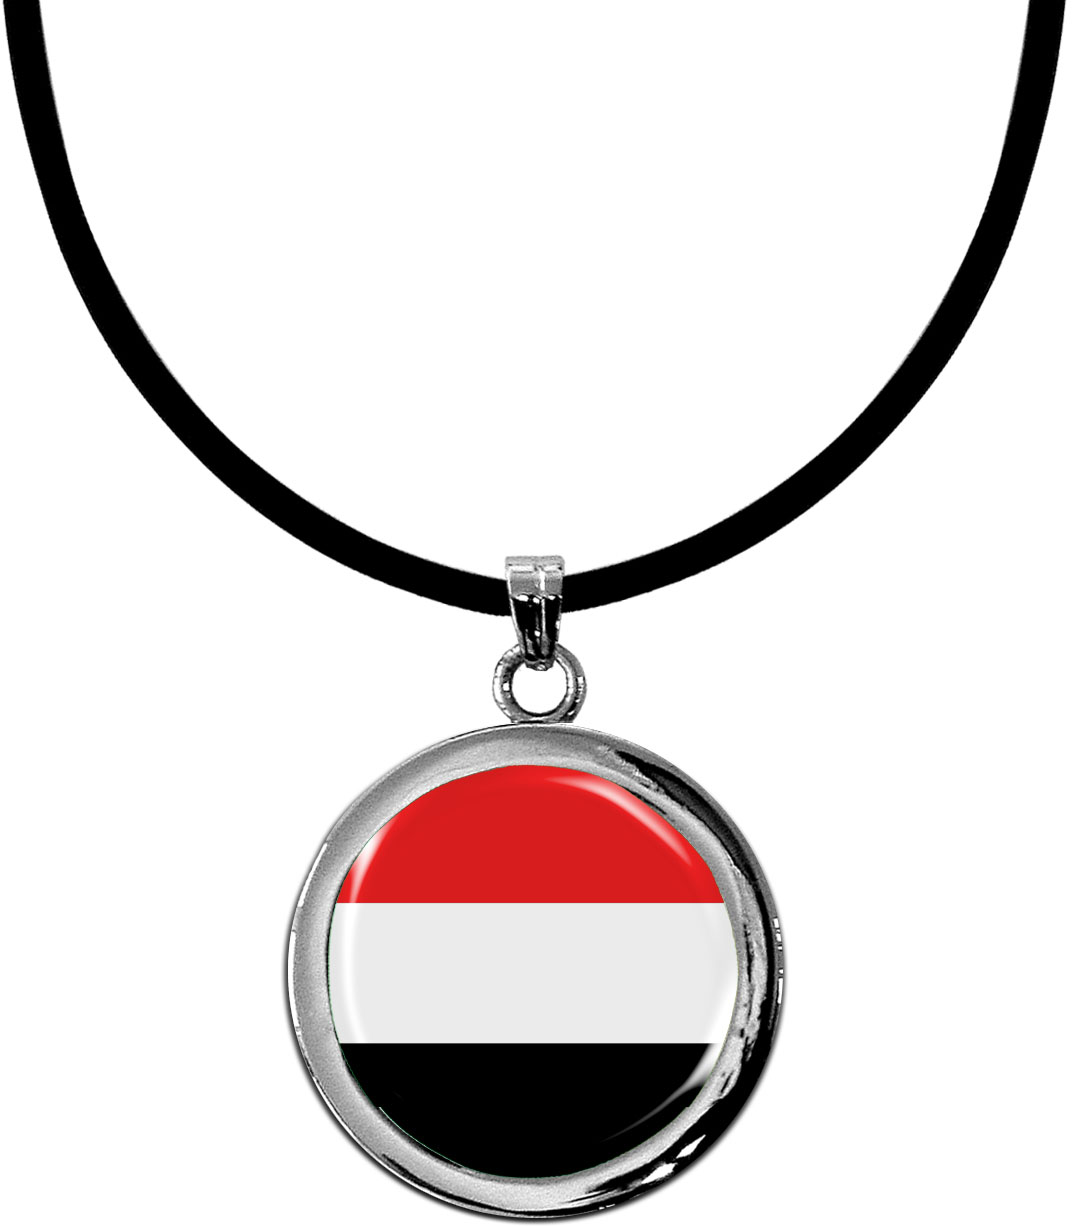 Kettenanhänger / Jemen / Silikonband mit Silberverschluss